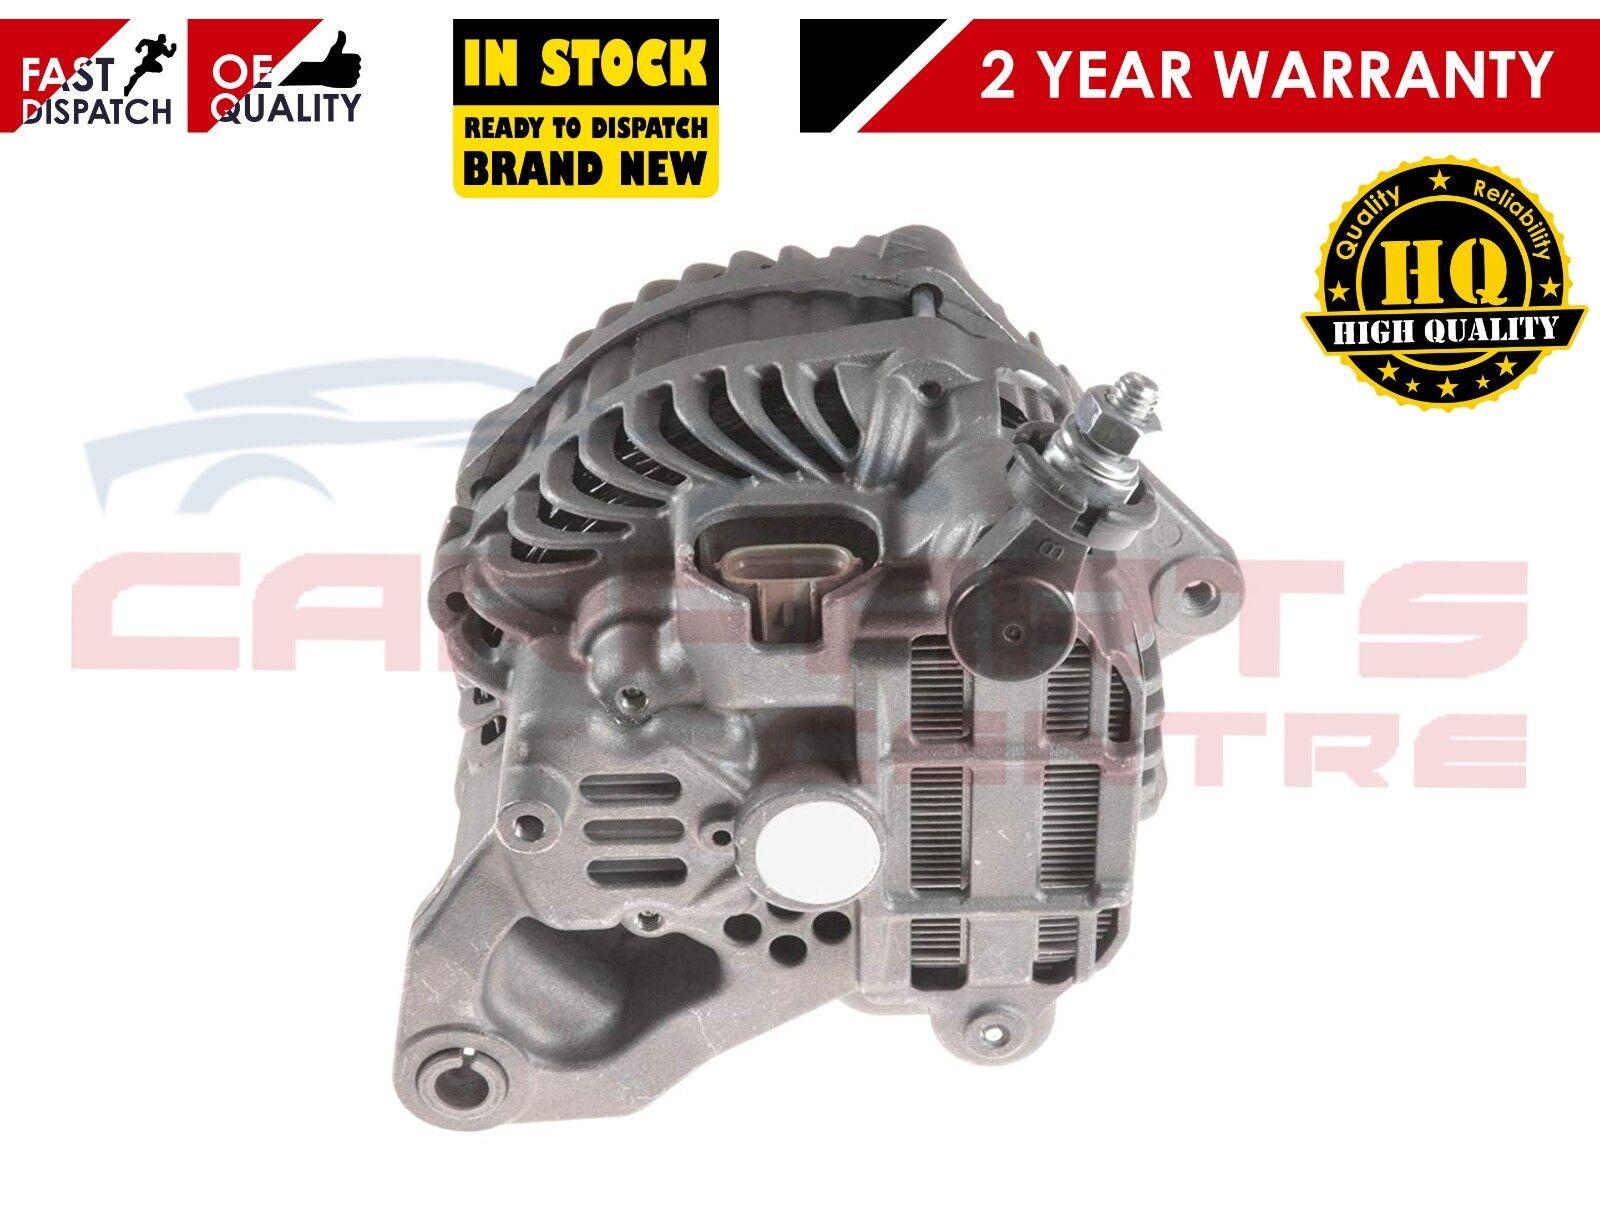 Para Nissan Pathfinder /& Navara D40 2.5 dCi Diesel 2005-10 Totalmente Nuevo Alternador